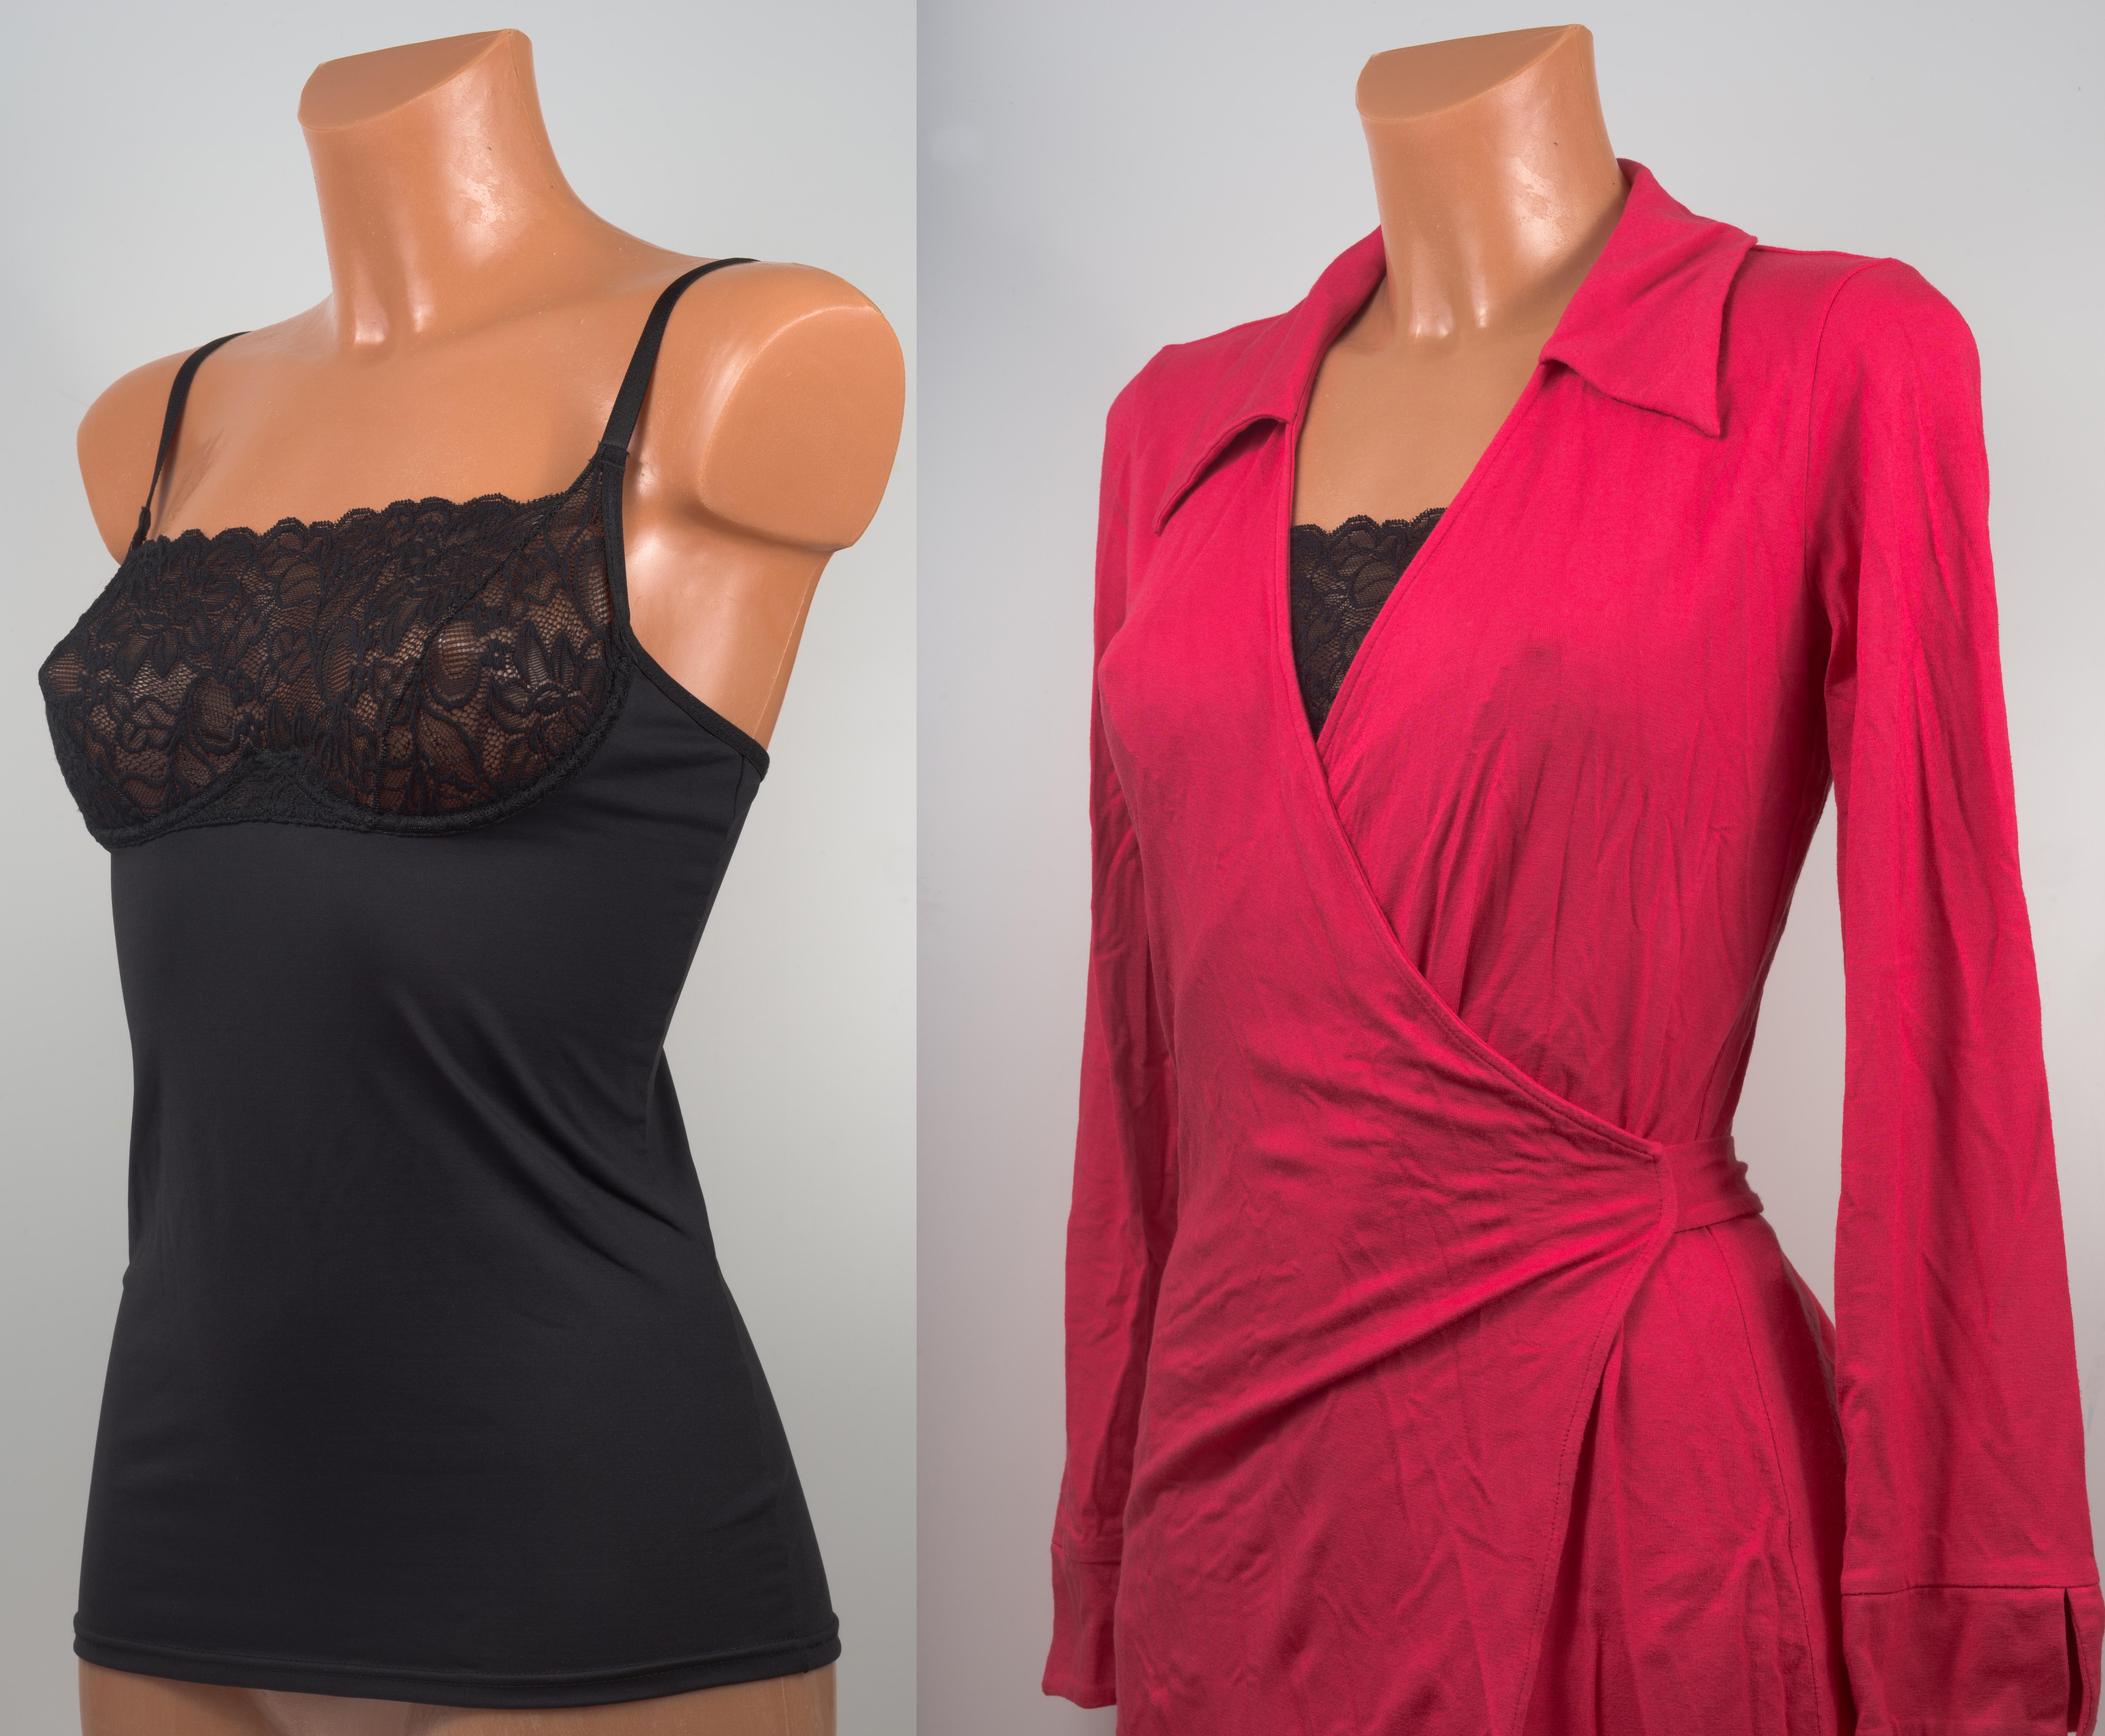 A black rayon bra shirt and a fuchsia wrap dress